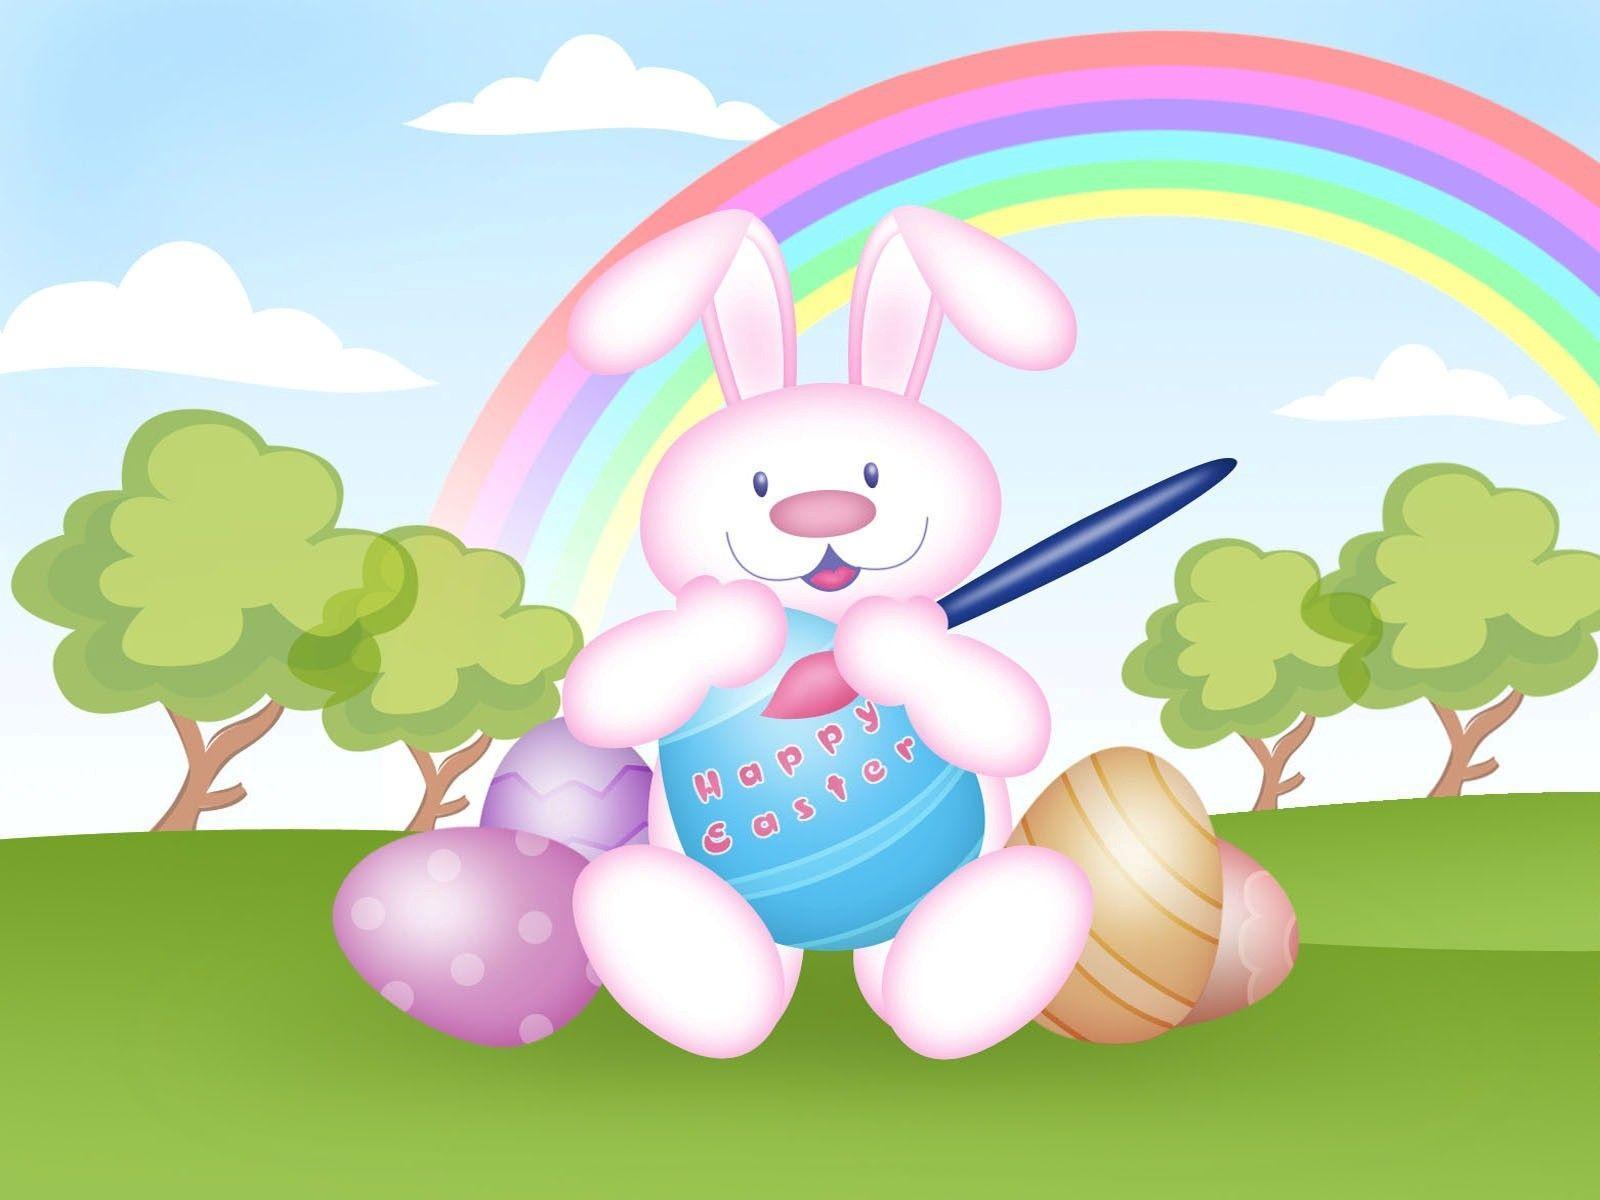 Cartoon Easter Wallpapers Top Free Cartoon Easter